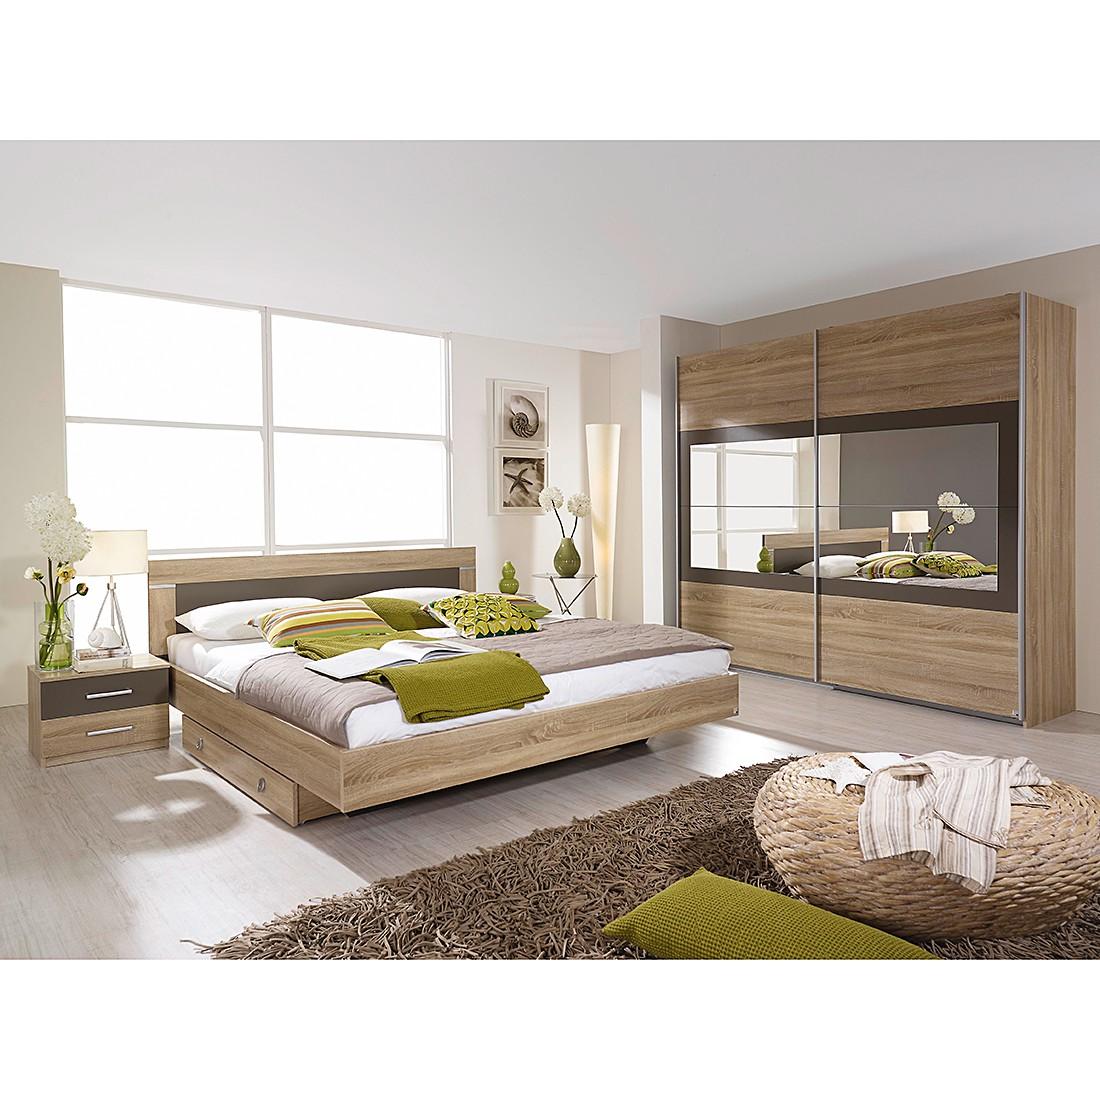 Slaapkamerset Venlo (4-delig) - sonoma eikenhoutkleurig/afwerking in lavagrijs - ligoppervlak: 160x200cm - kastbreedte: 226cm, Rauch Packs